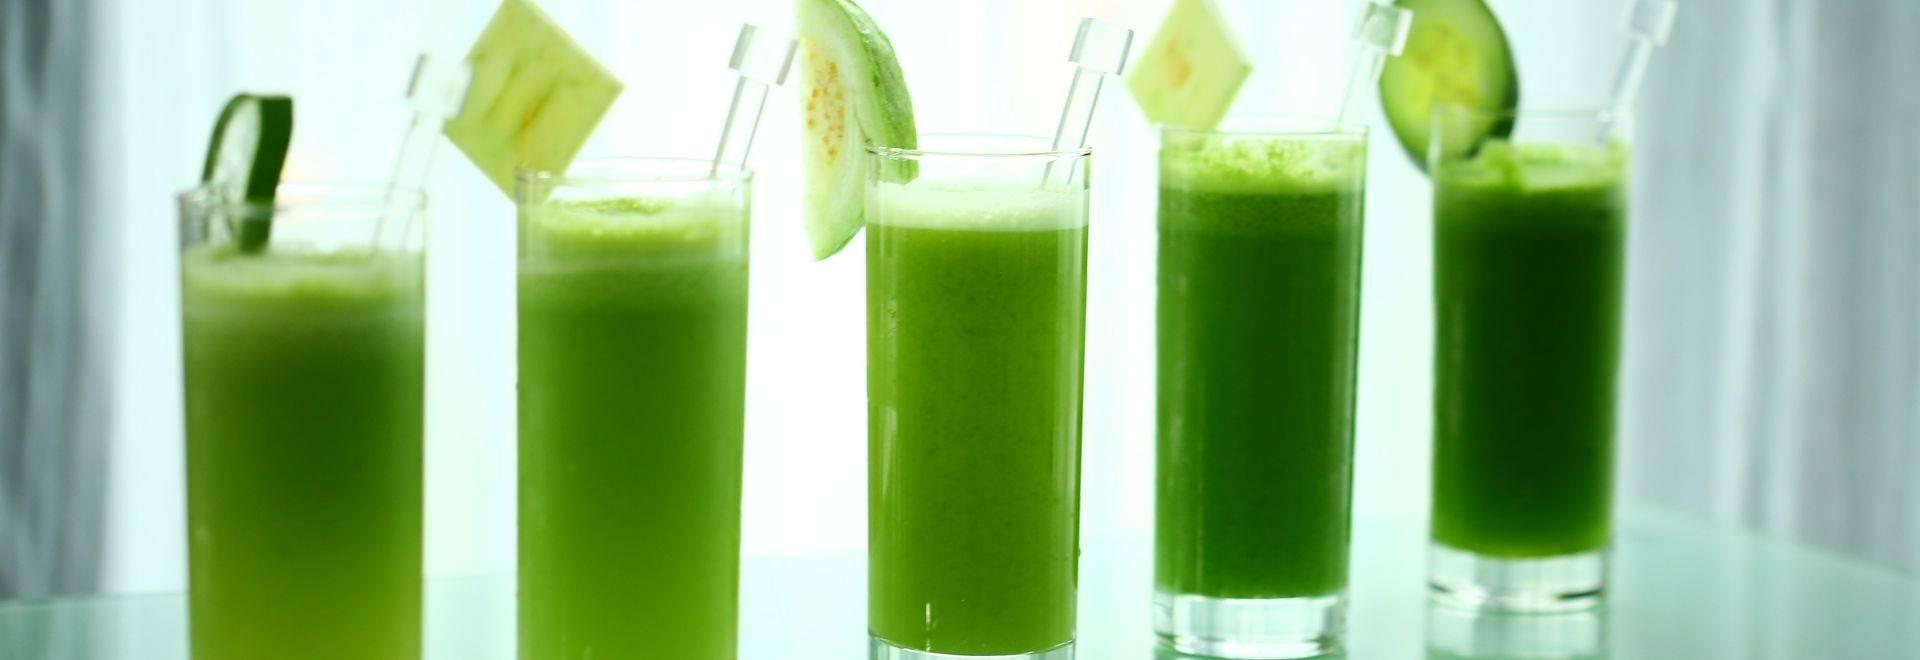 Fusion-Maia-fresh-juice.jpg